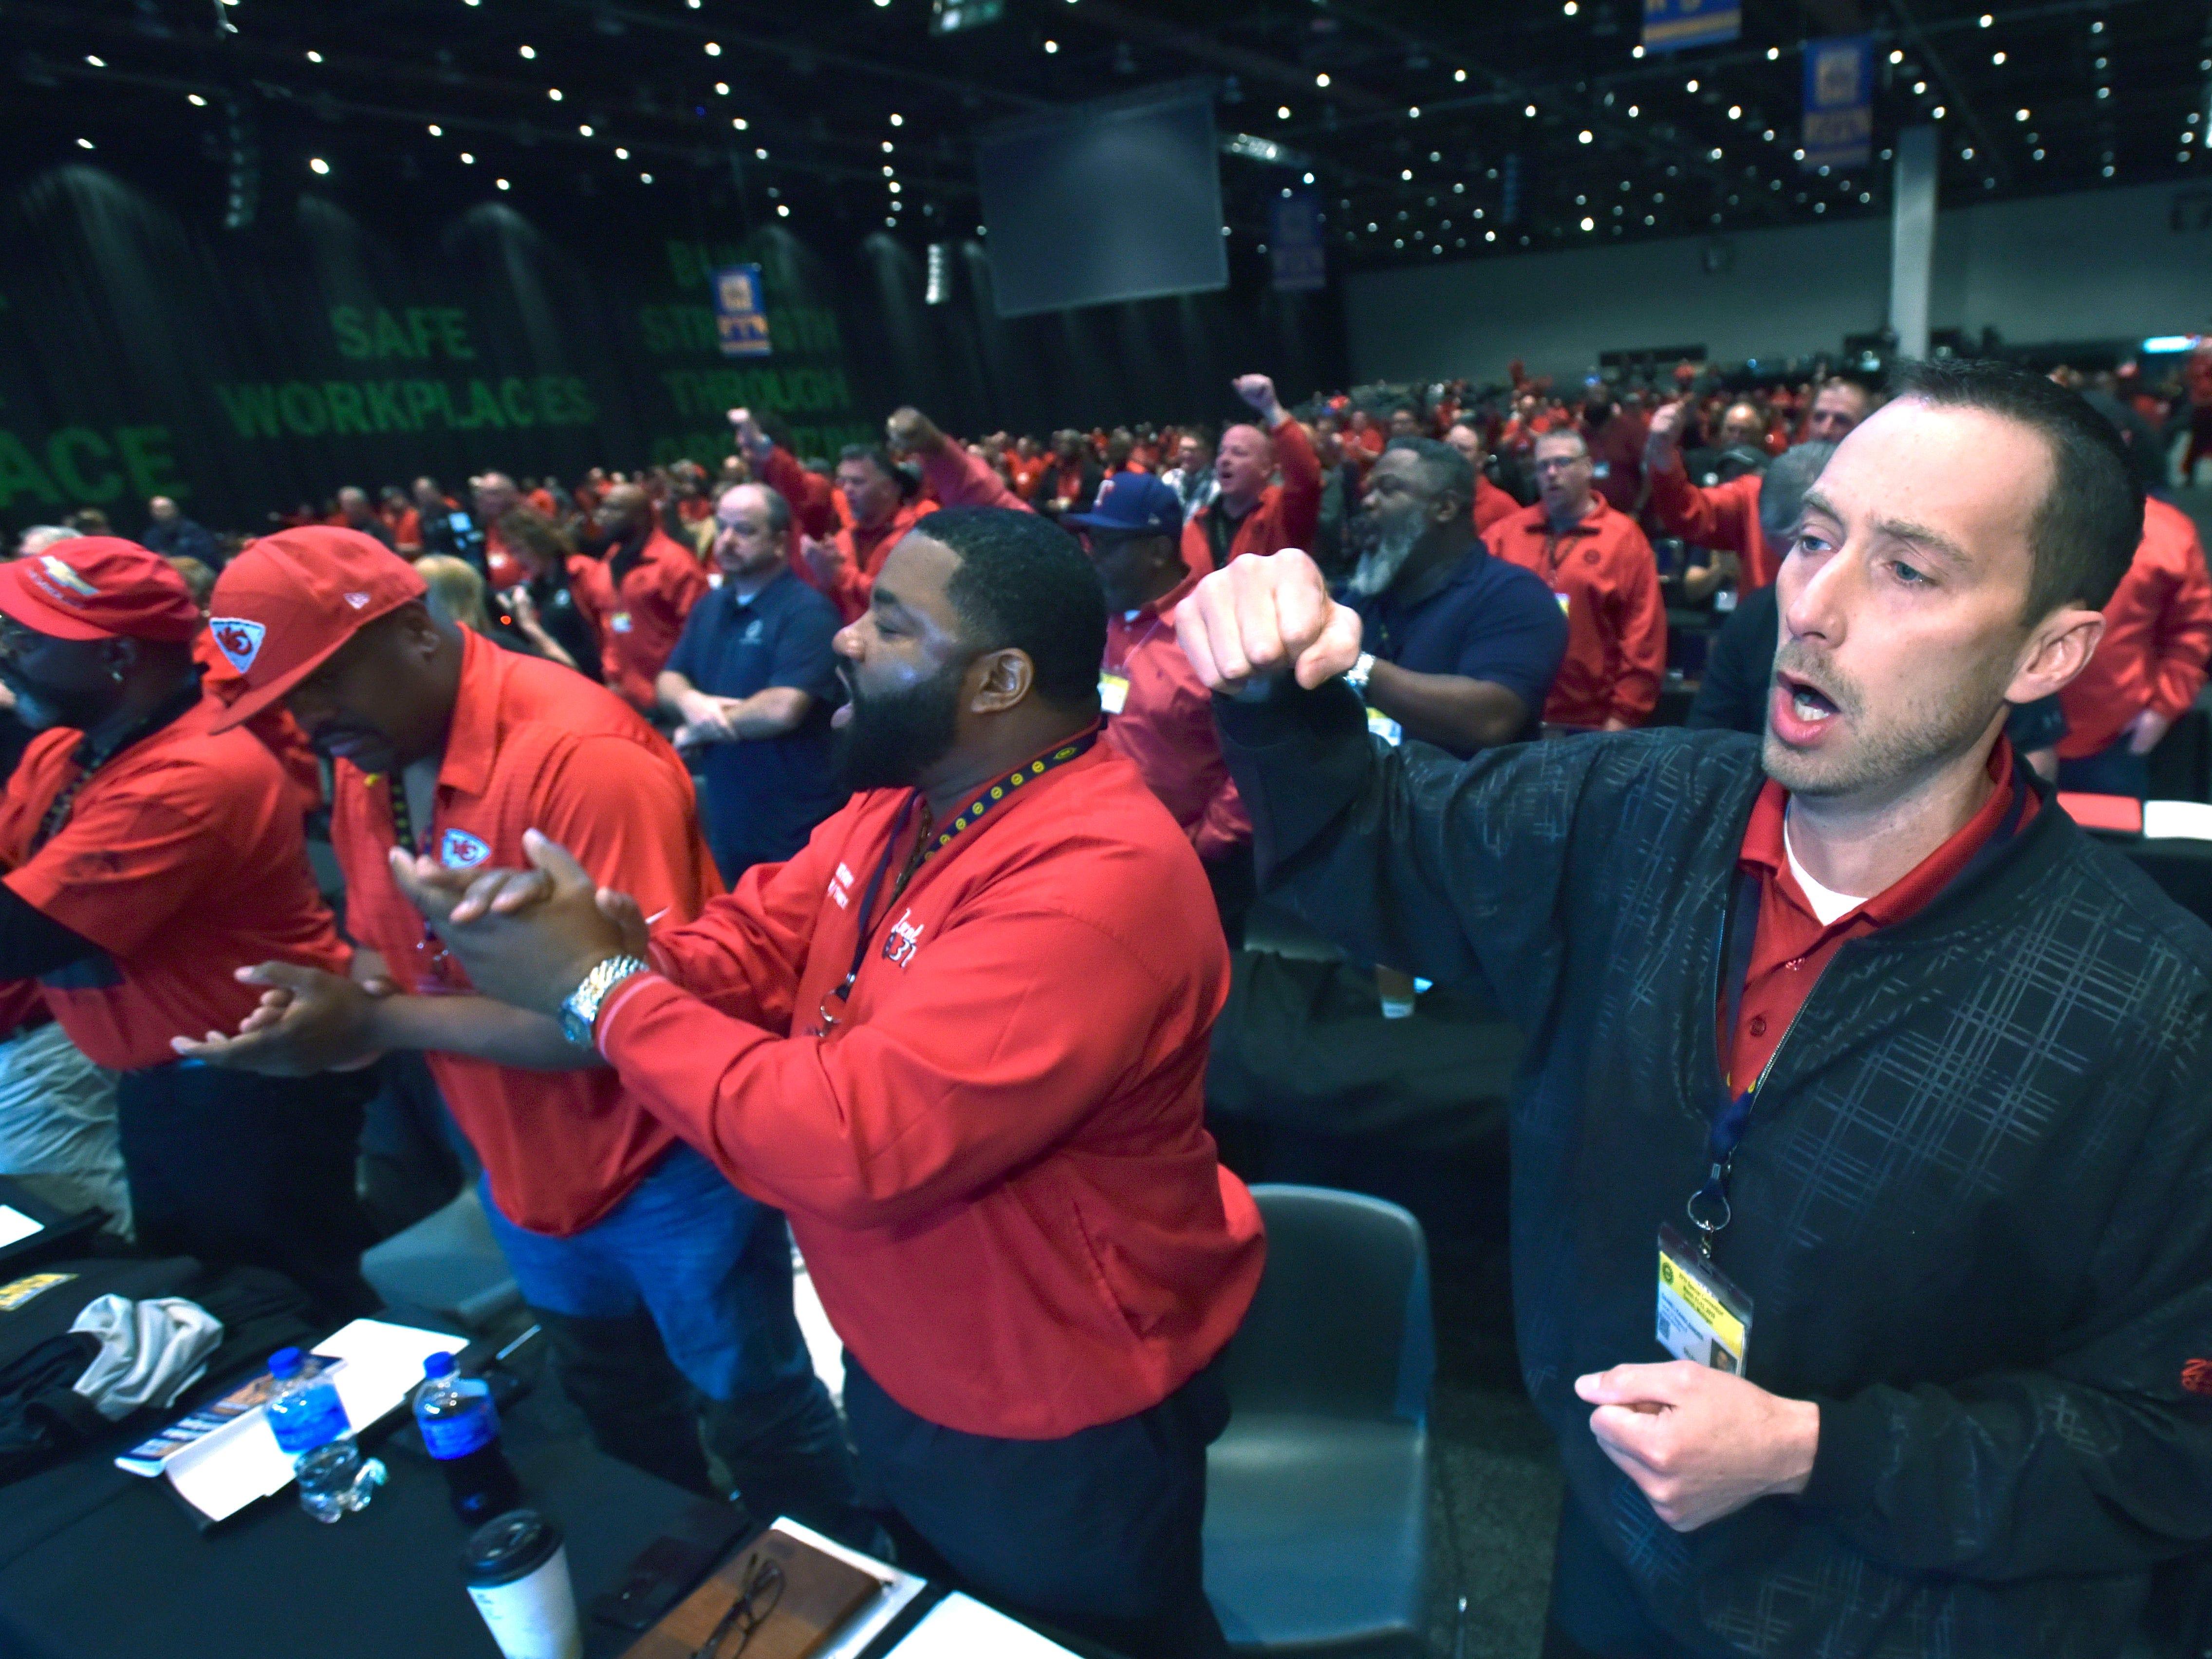 From right, Region 5 Local 31 UAW delegates Dan Kandlbinder and Anthony Walker, both of Kansas City, Missouri, cheer during UAW Gary Jones' address.